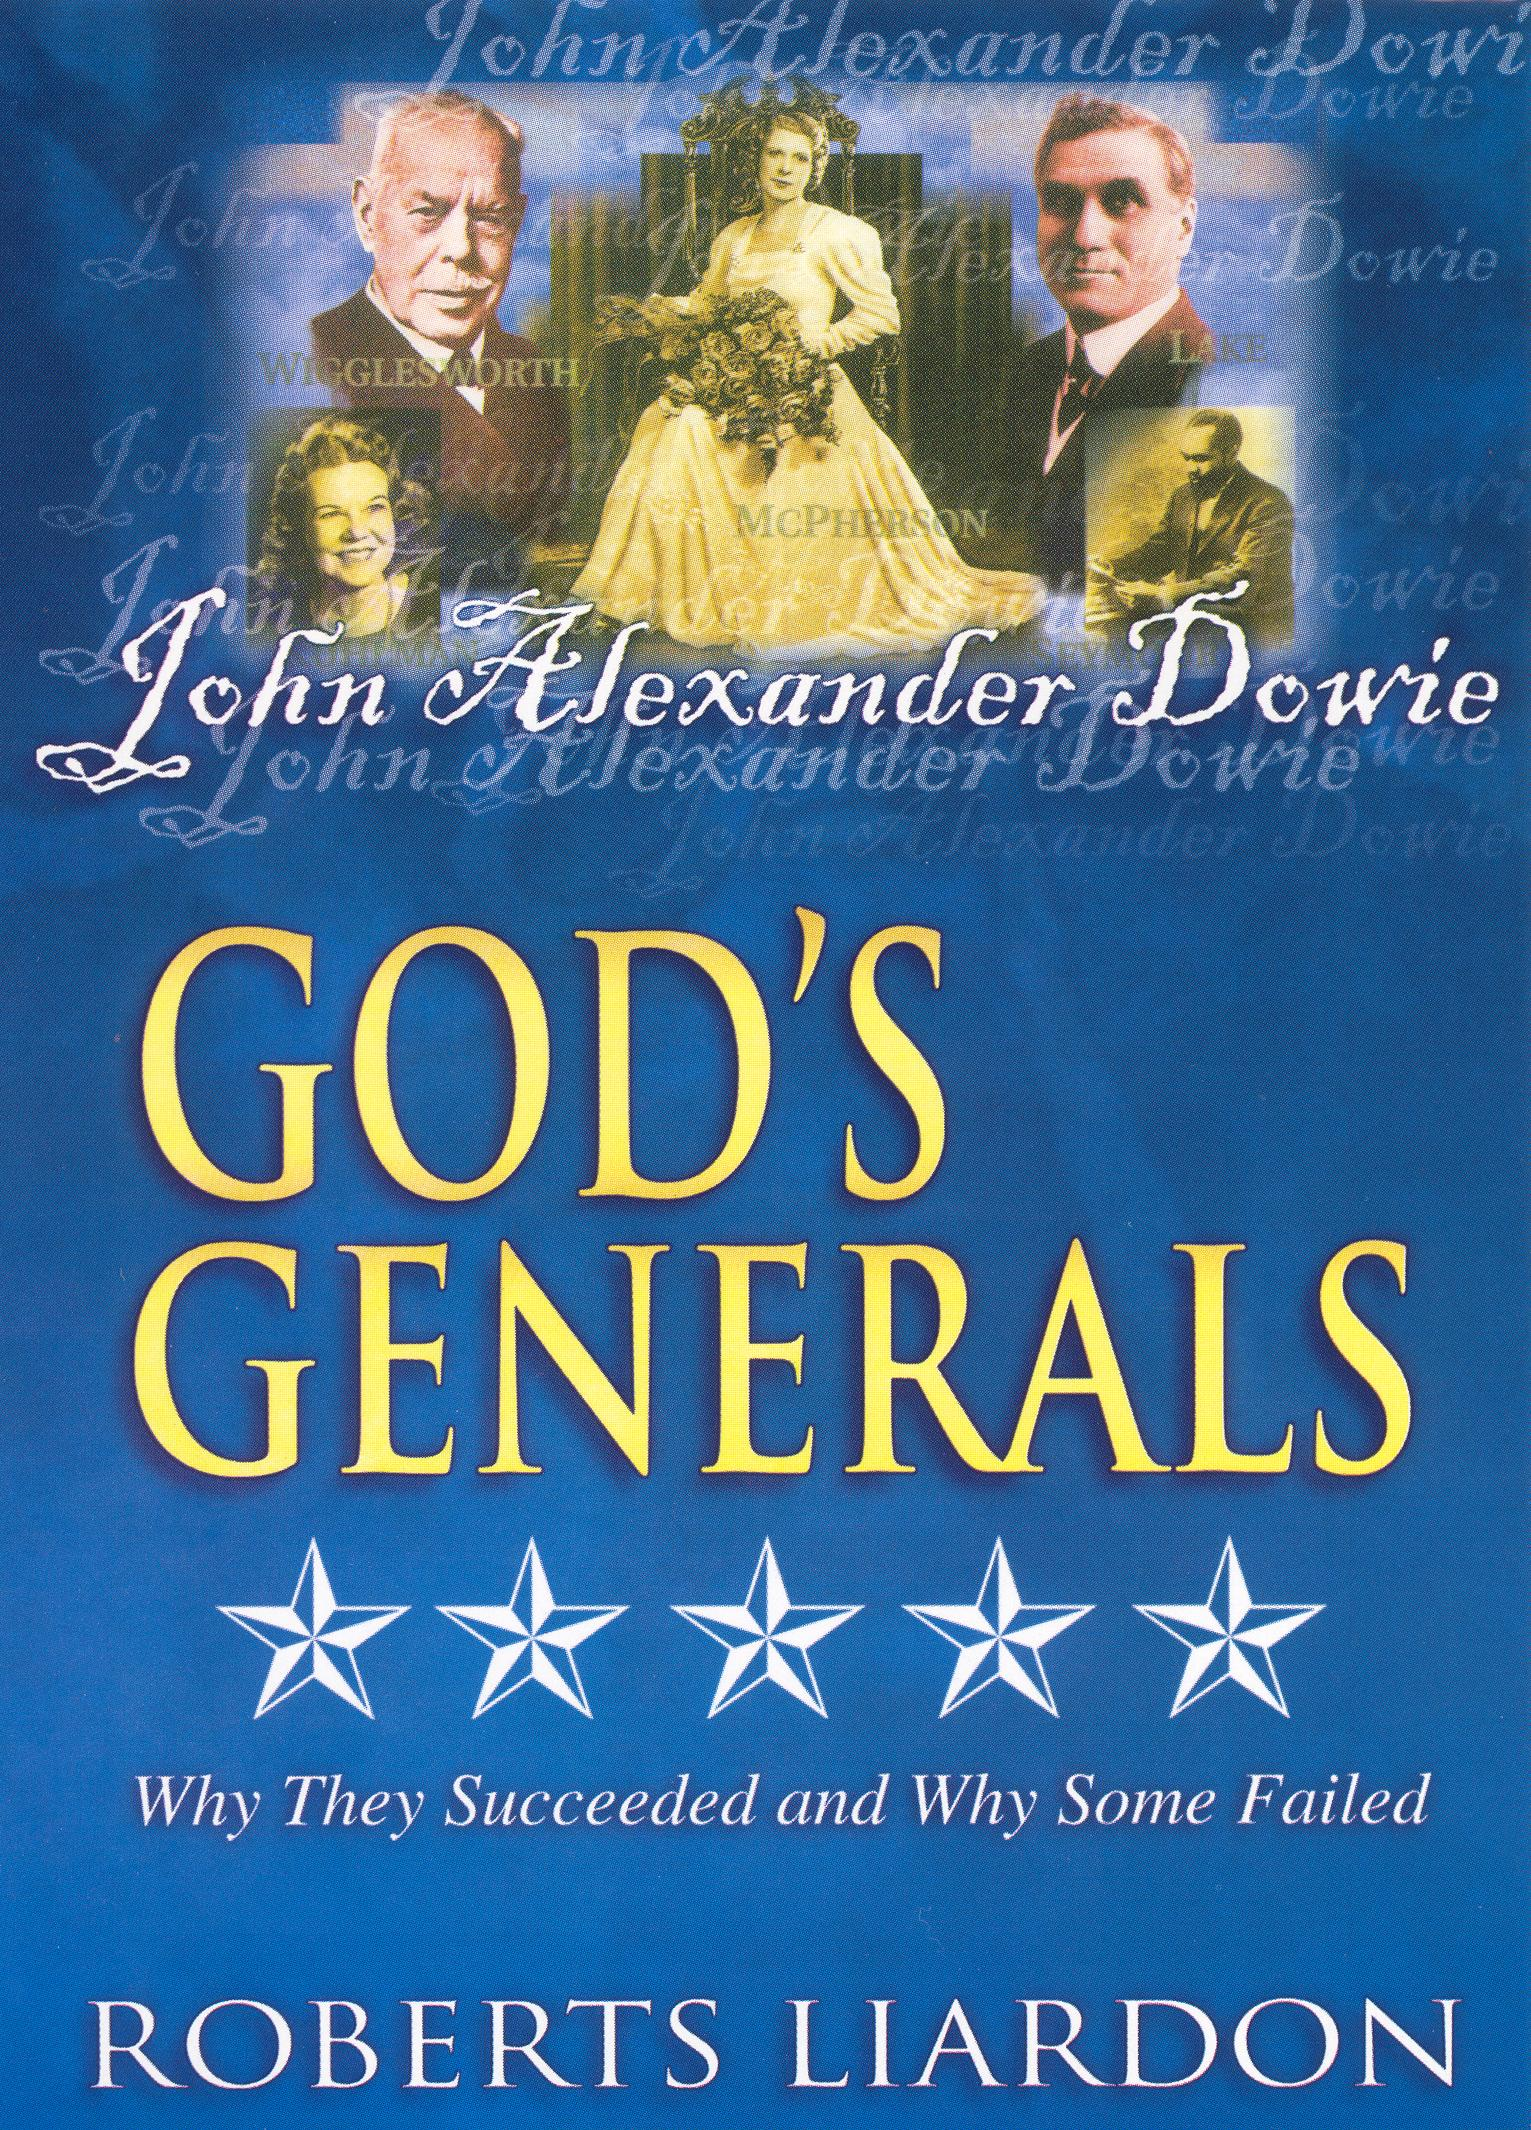 God's Generals: John Alexander Dowie - Apostle of Devine Healing